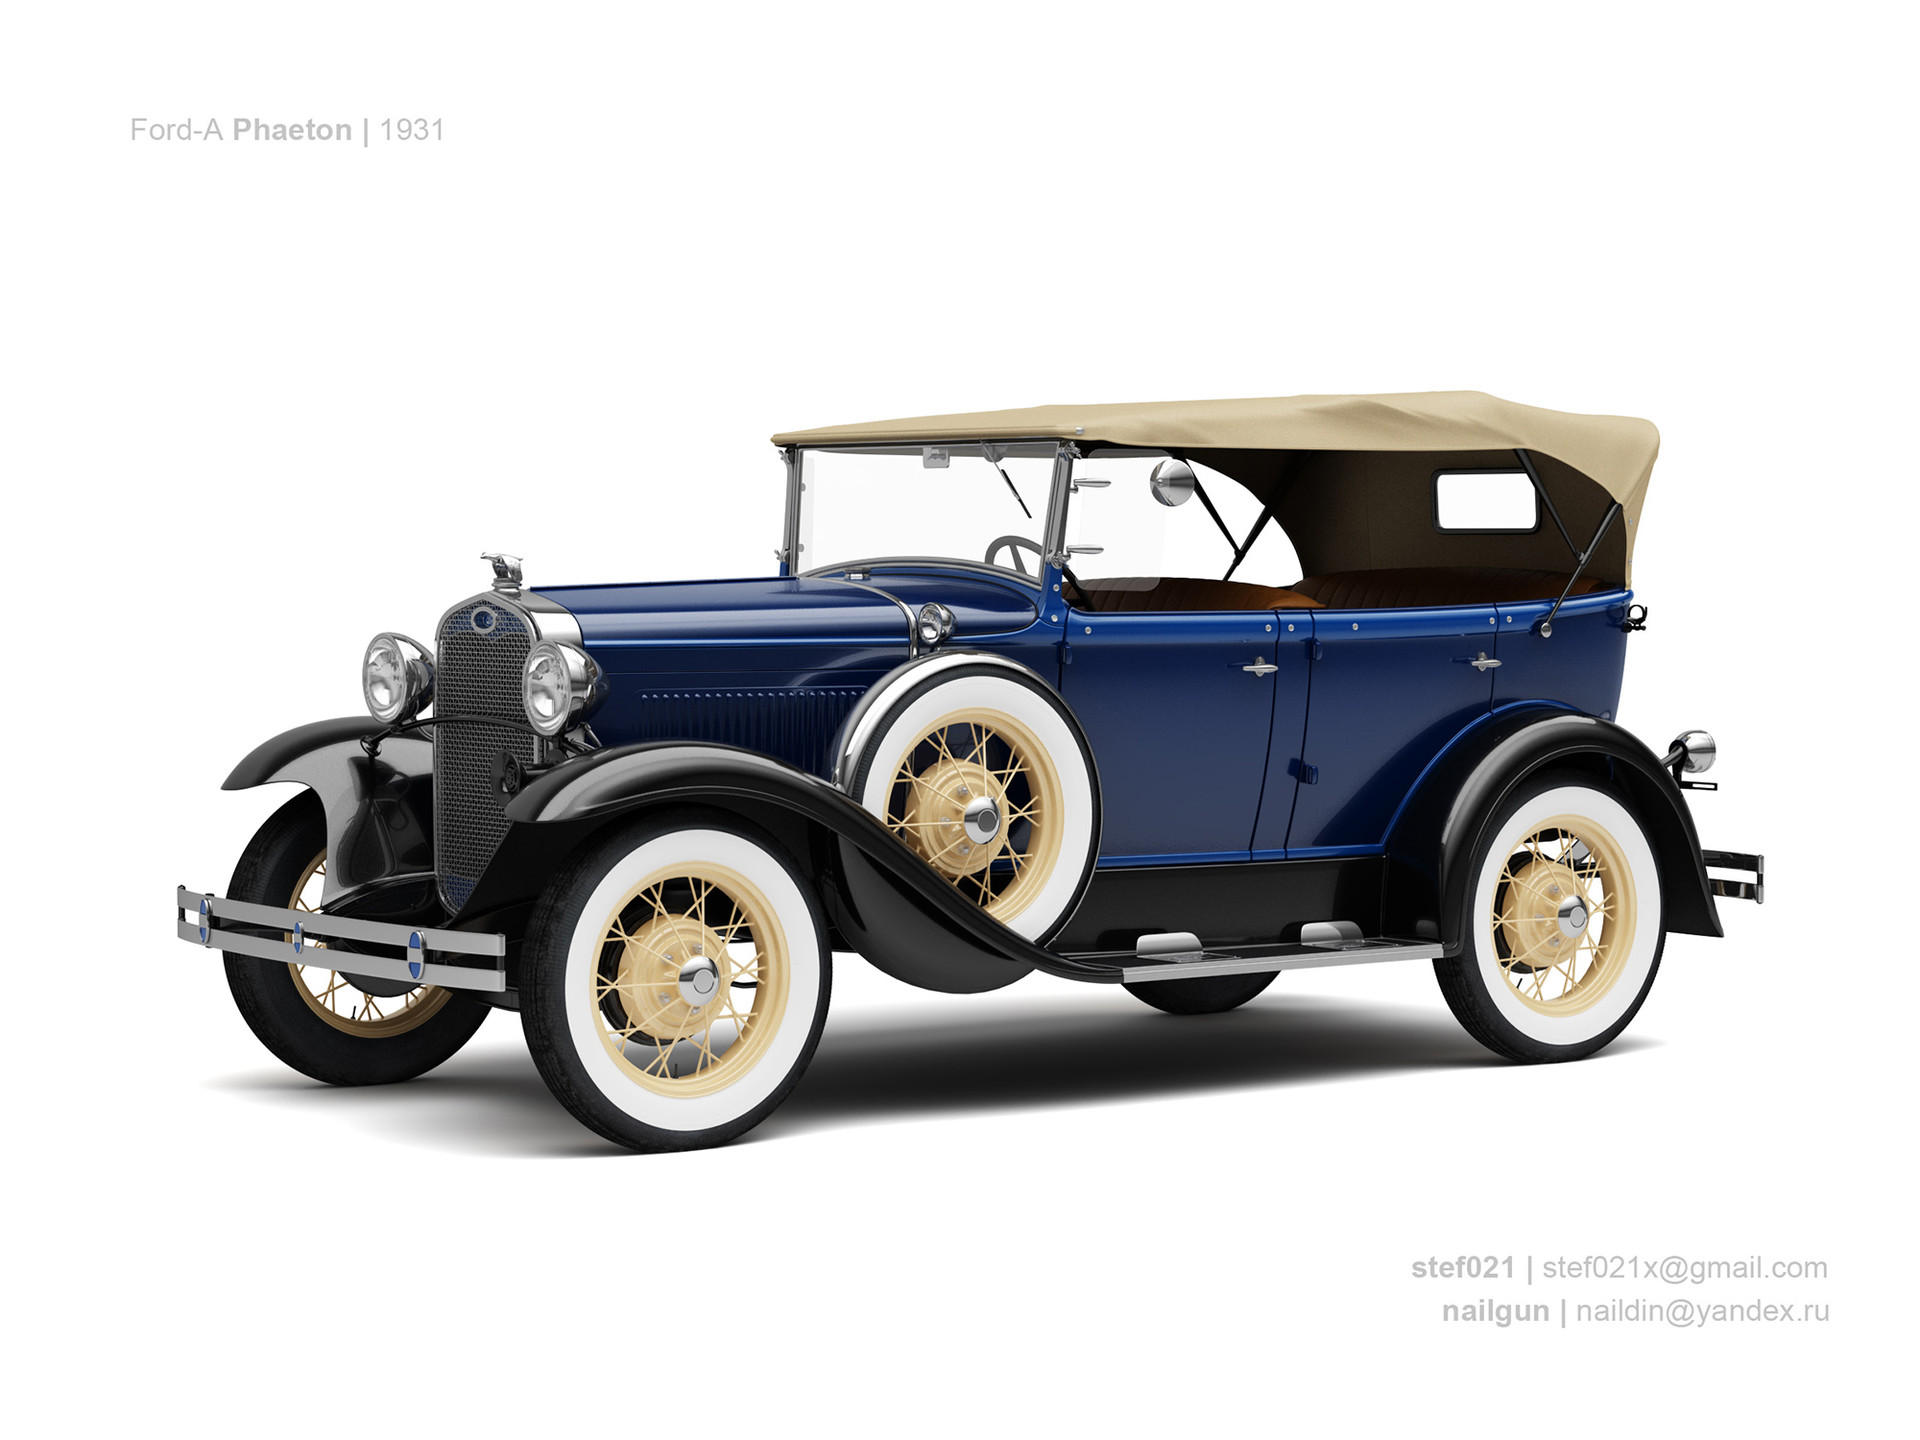 Nail khusnutdinov usa ford a phaeton 1931 0